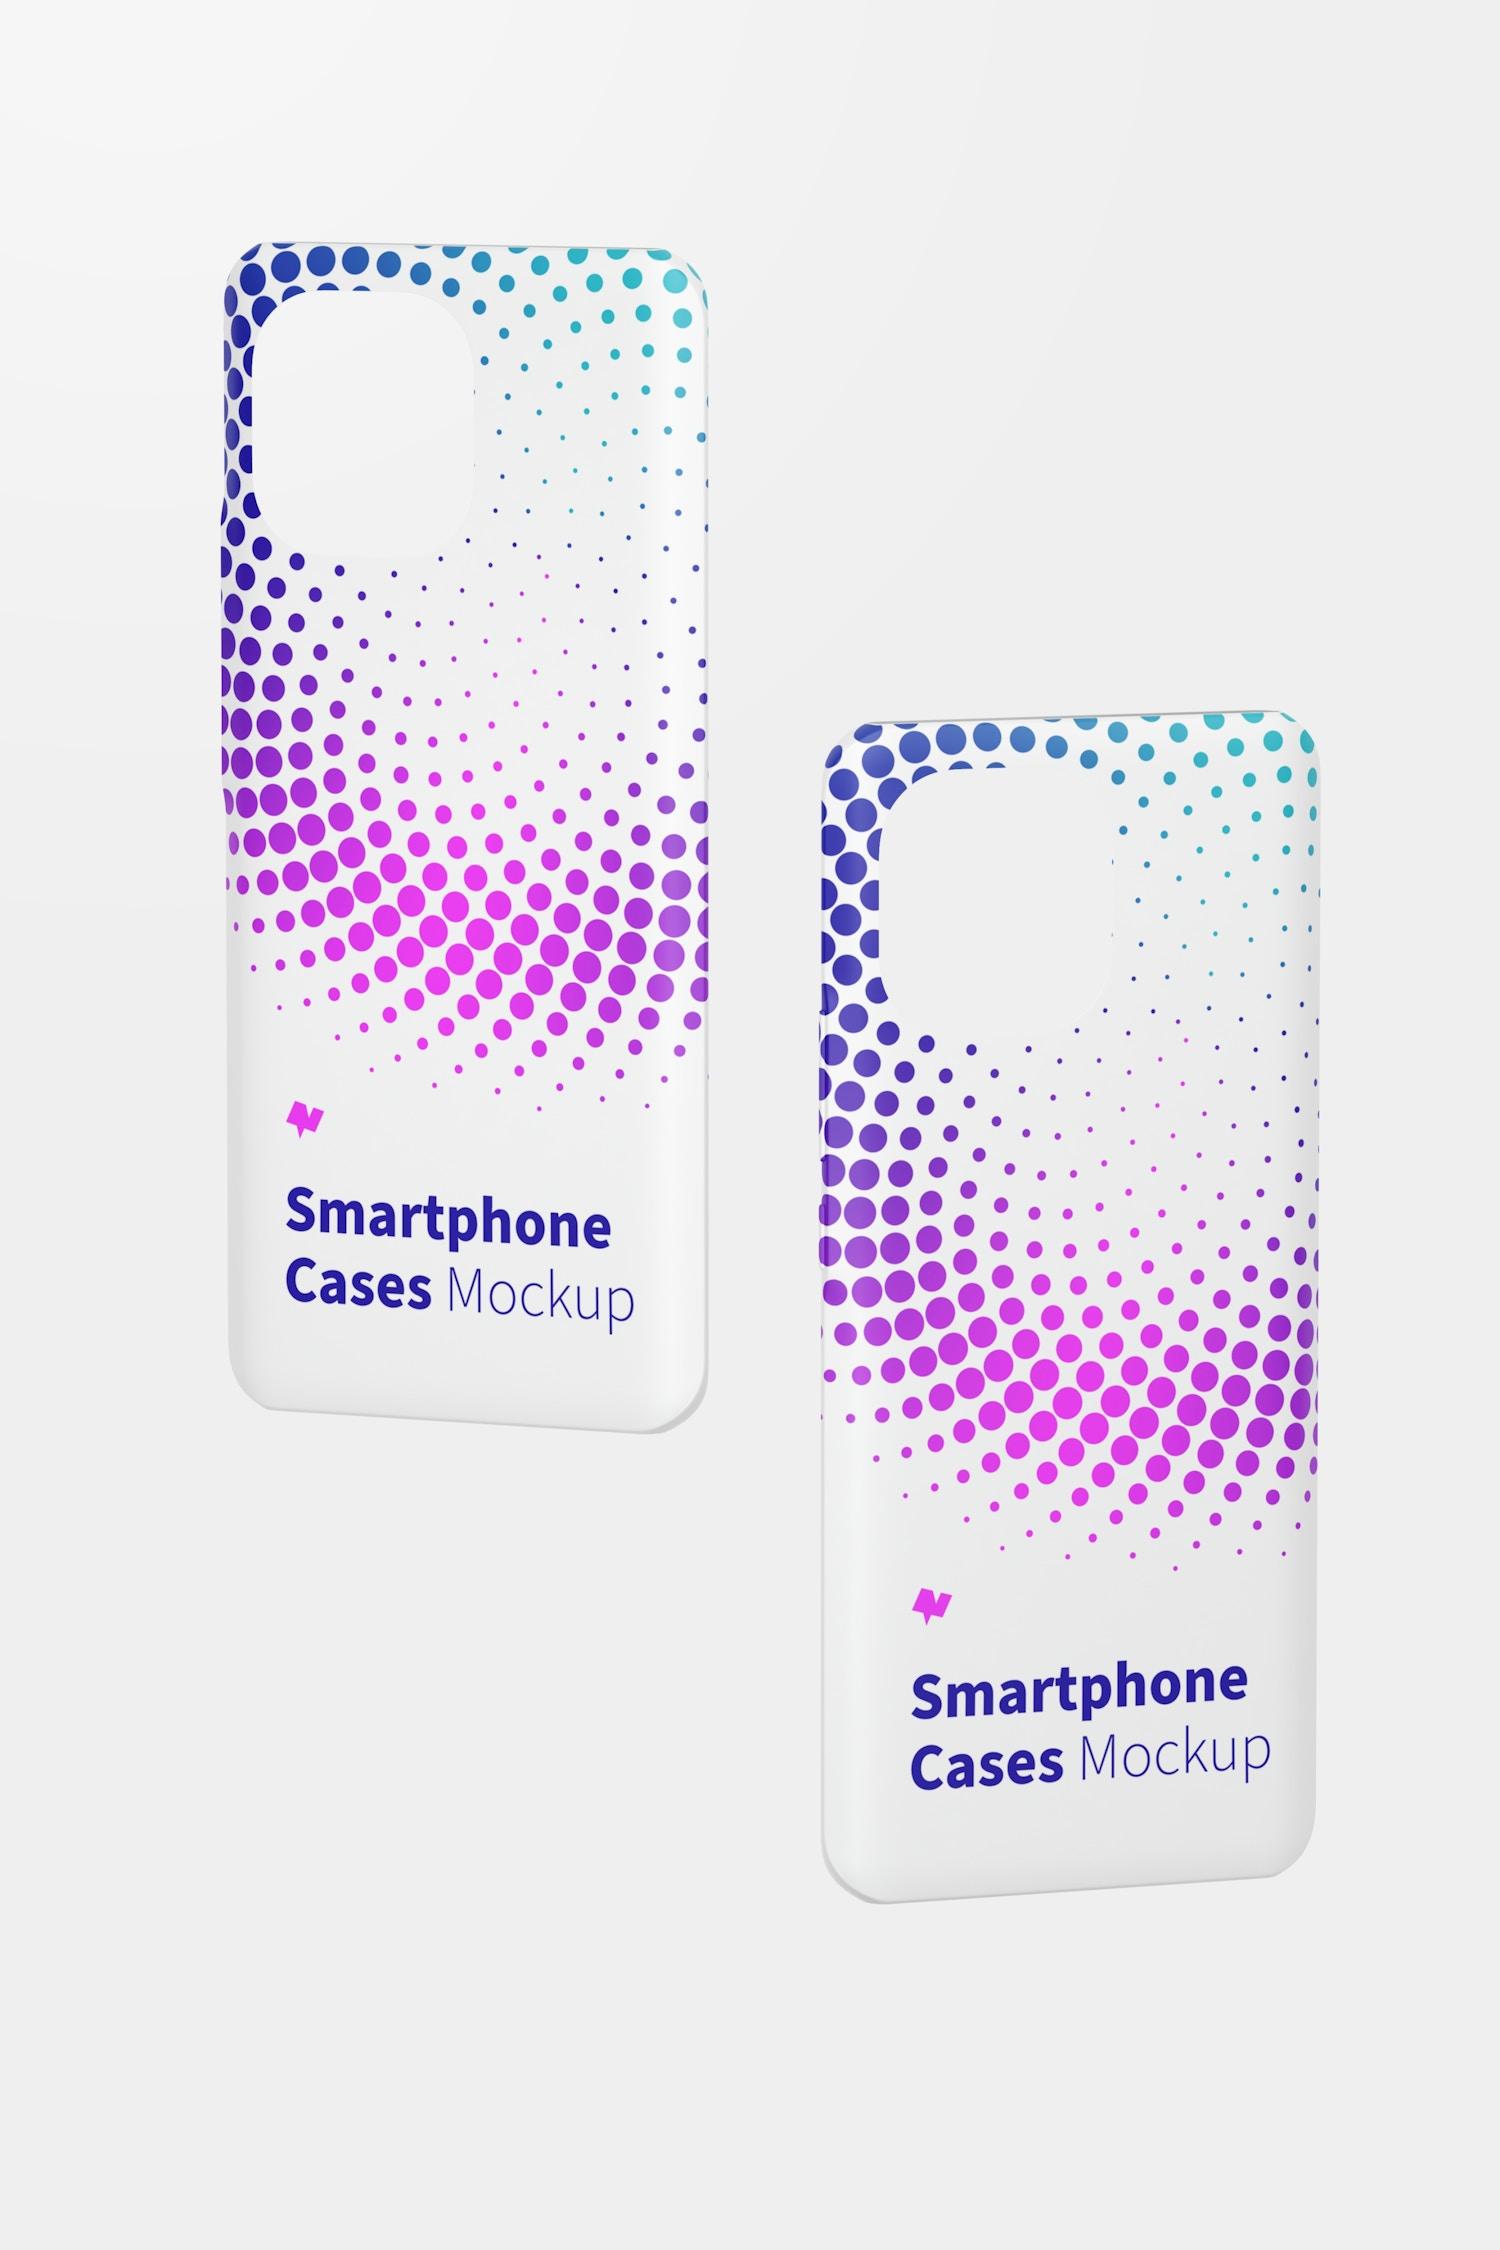 Xiaomi Case Mockup, Floating